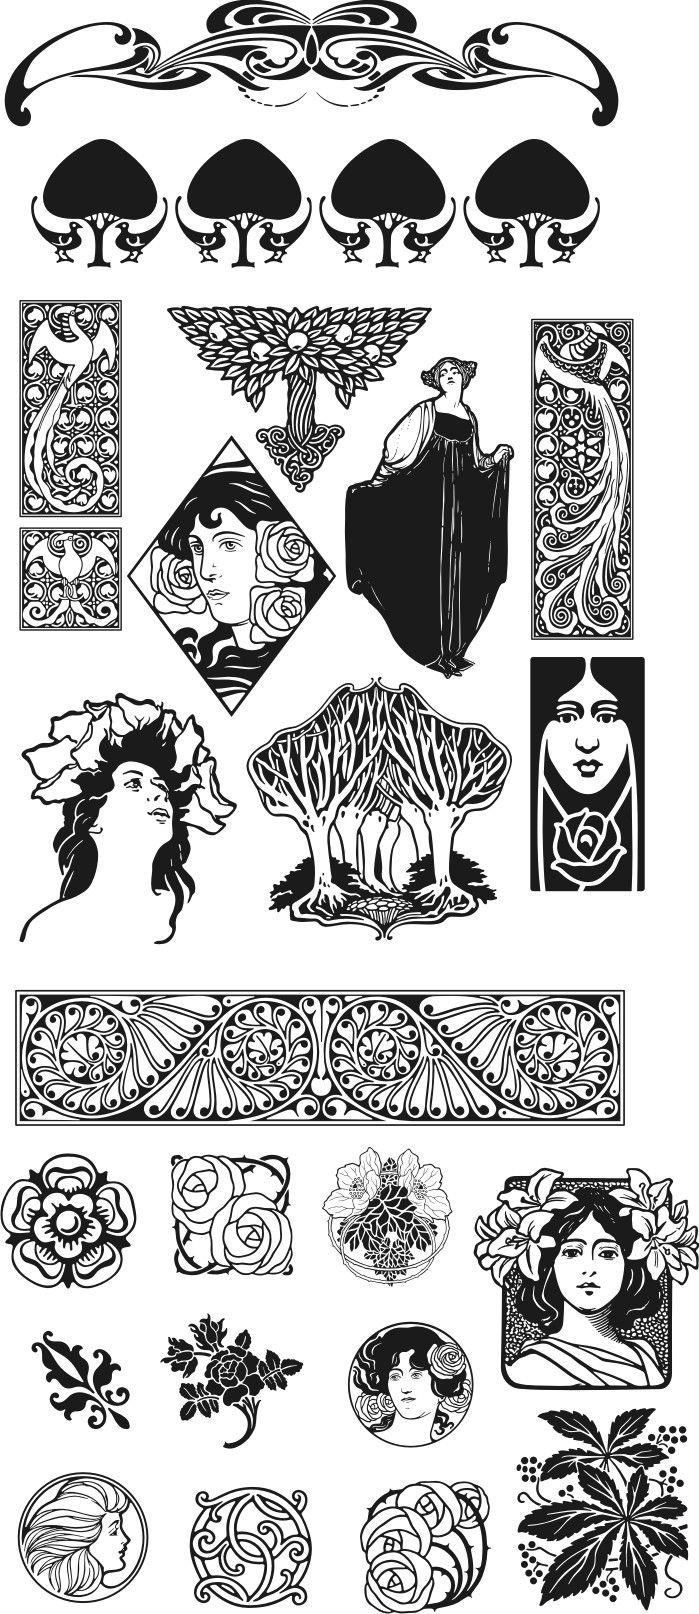 Arts Crafts Art Nouveau Vector Graphics Collection | eBay